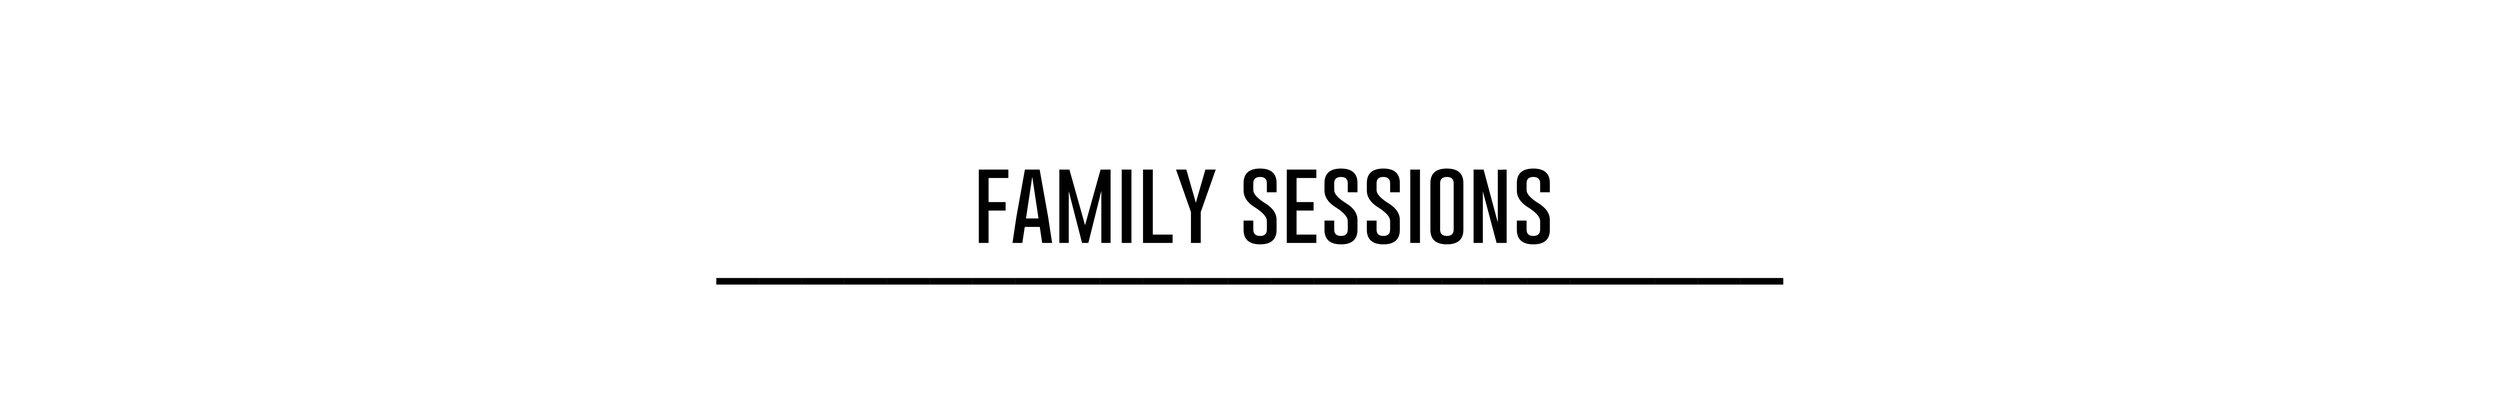 familysessions.jpg